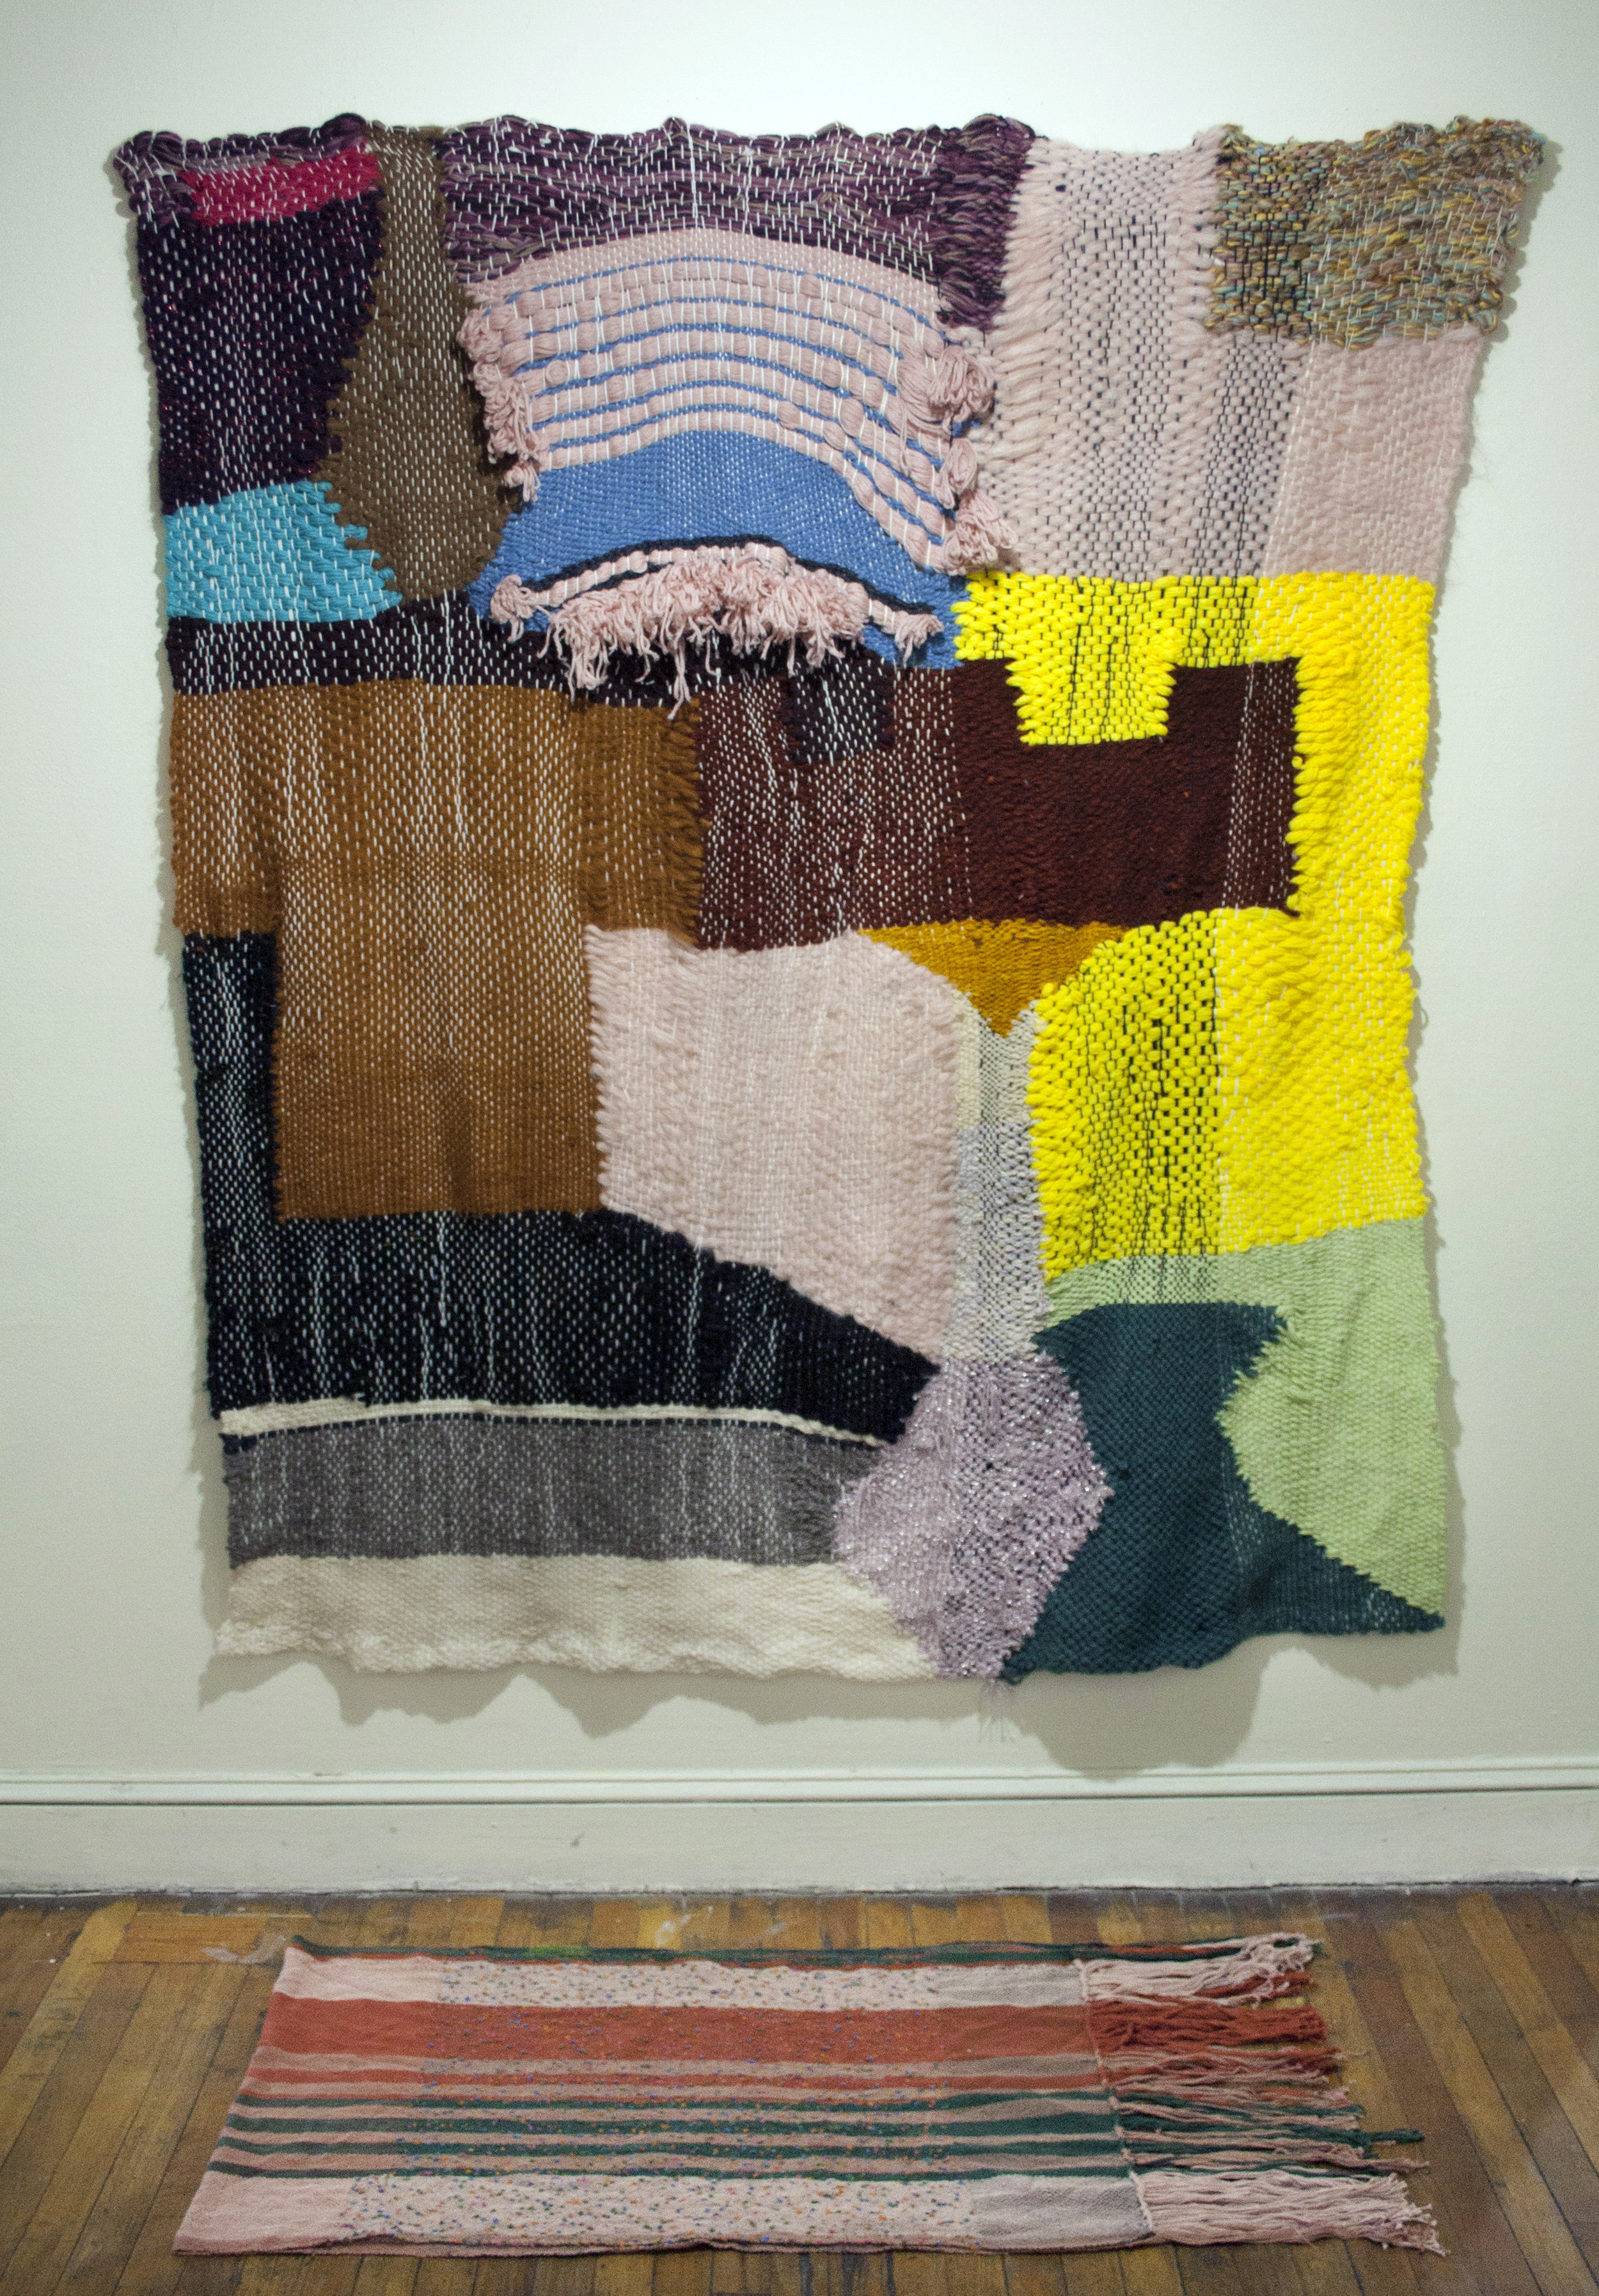 strange terrain tapestry weaving 5x7'  stati(c)s handweaving 8x2'